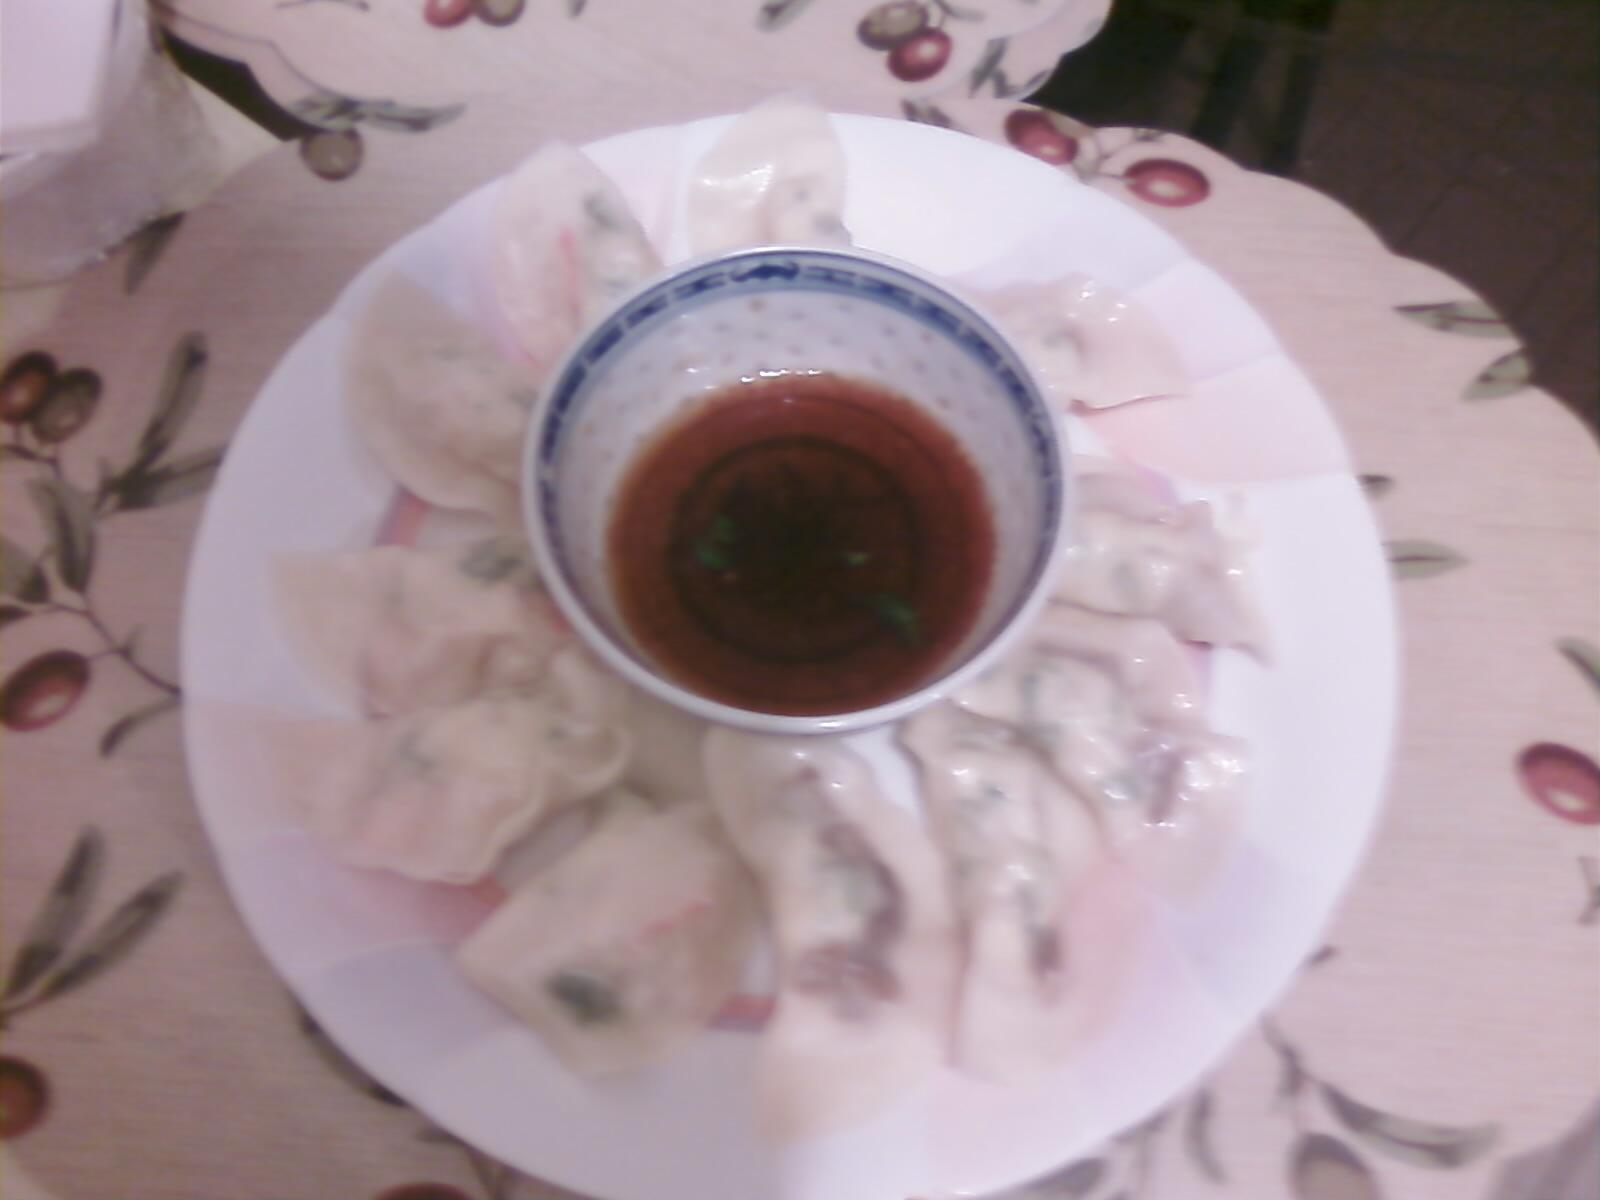 socal :: dumplings, get your homemade dumplings here...